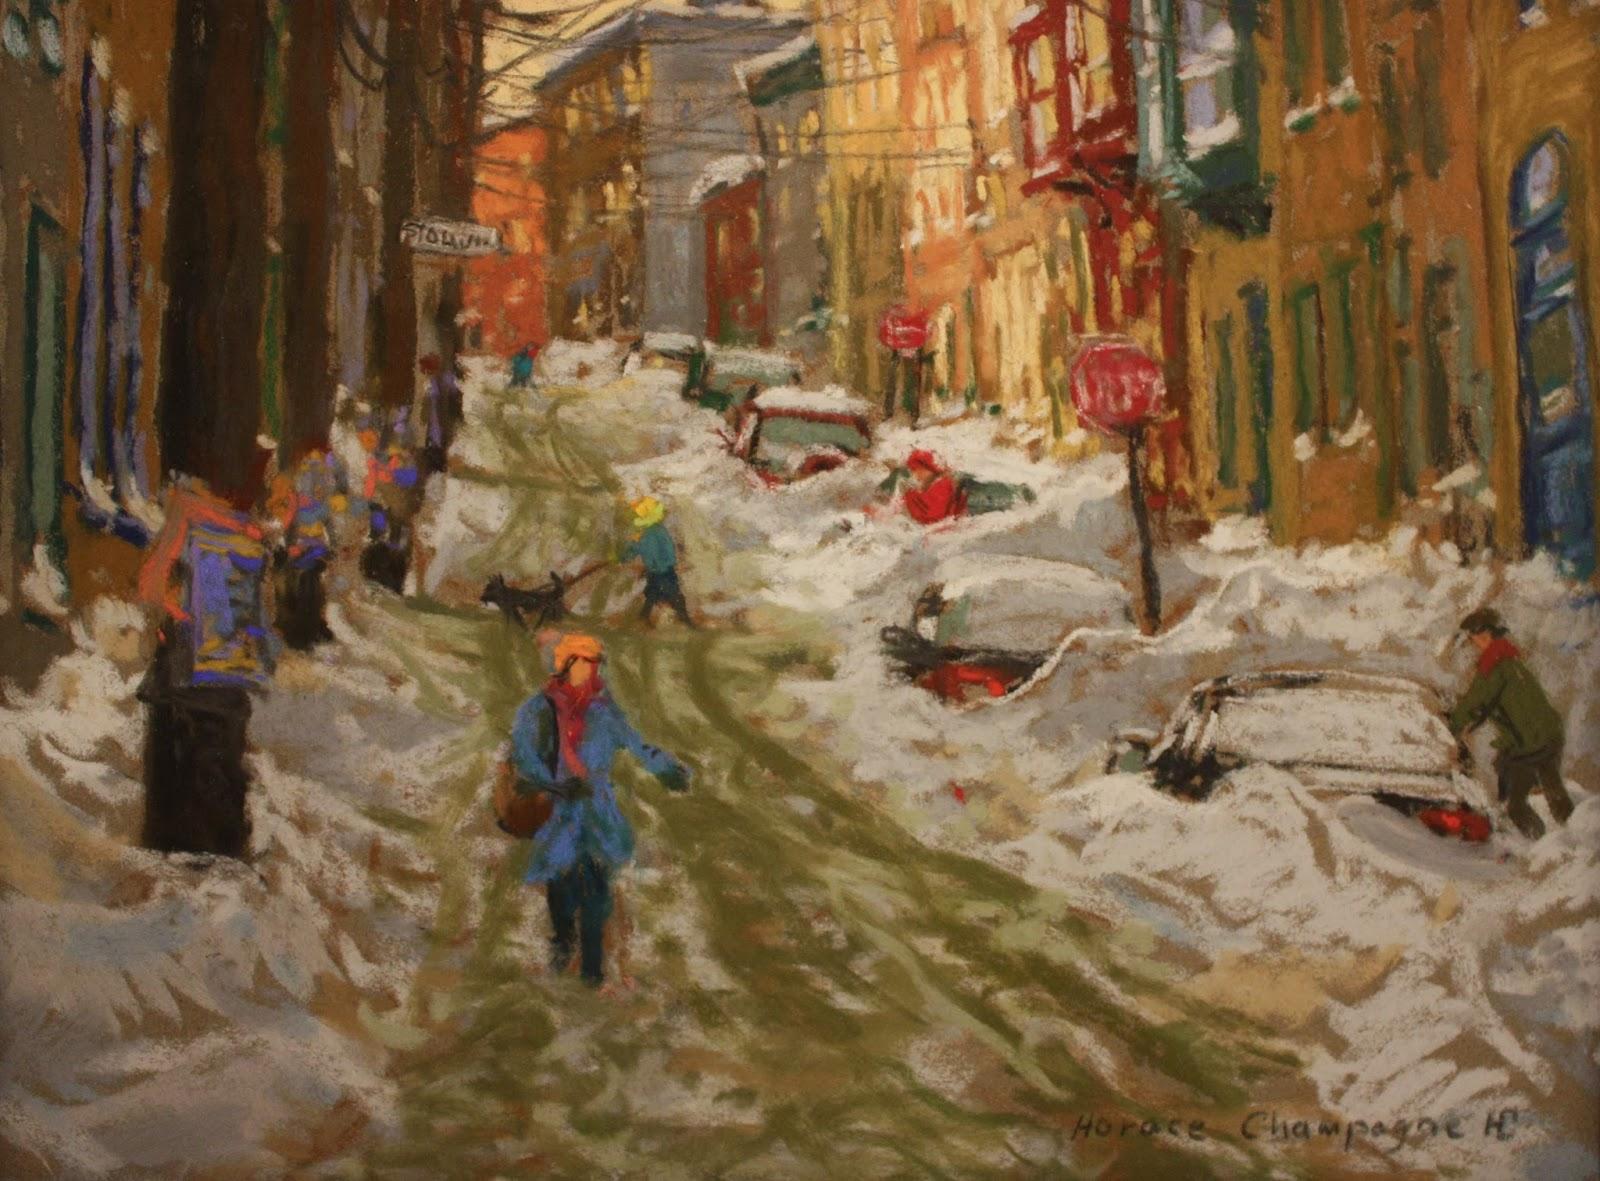 descriptive essay on winter wonderland